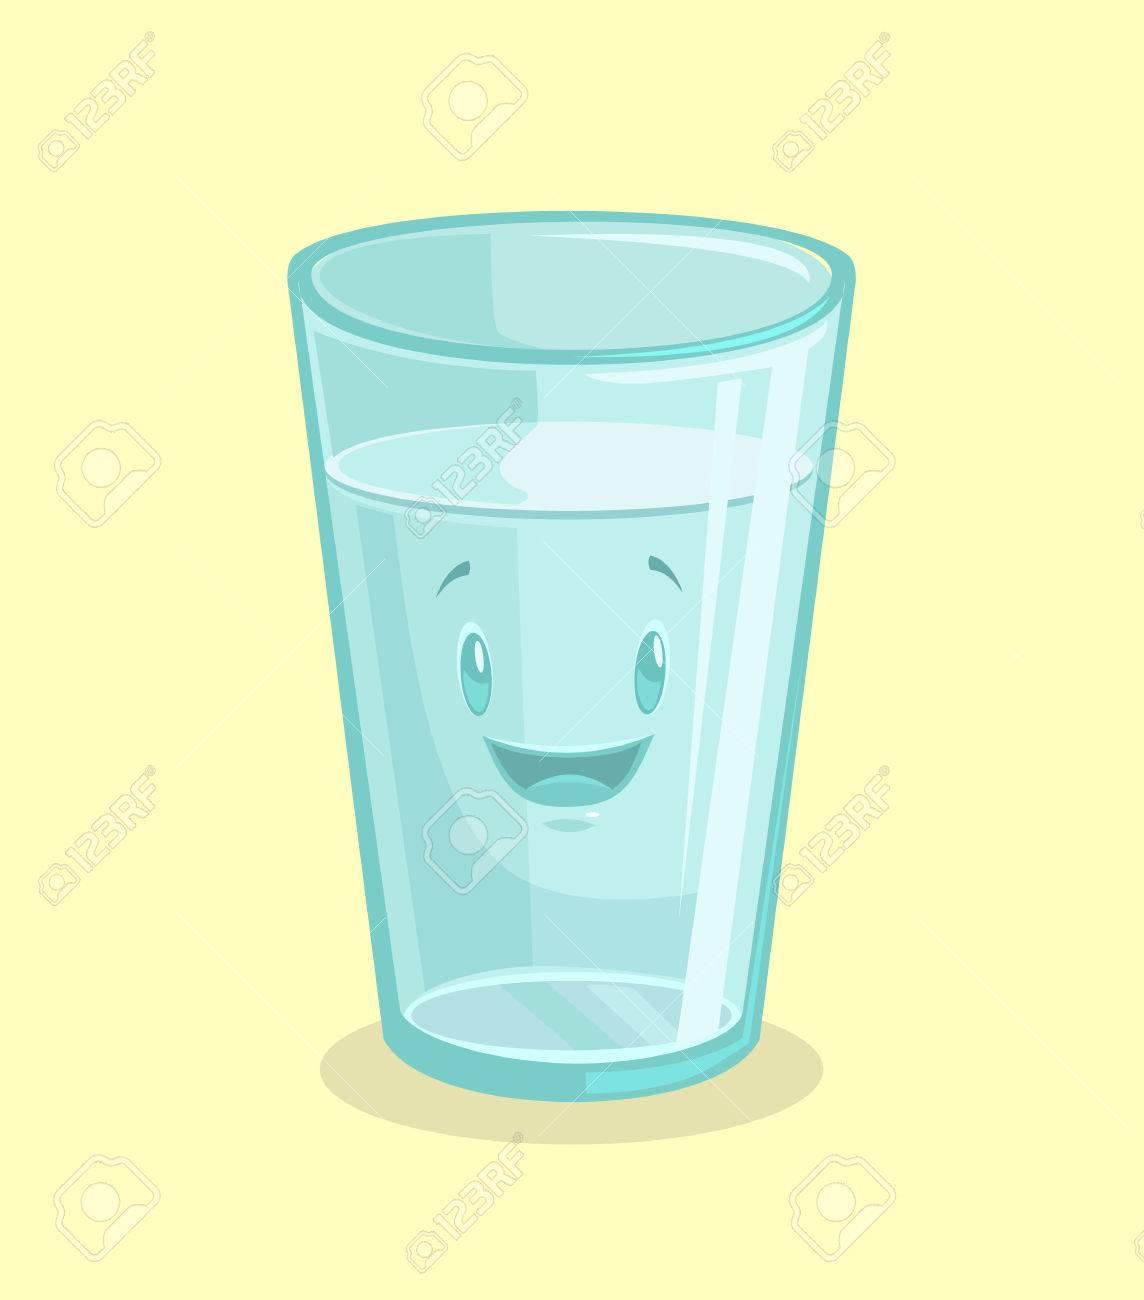 Full glass of water. Vector flat cartoon illustration - 59015891